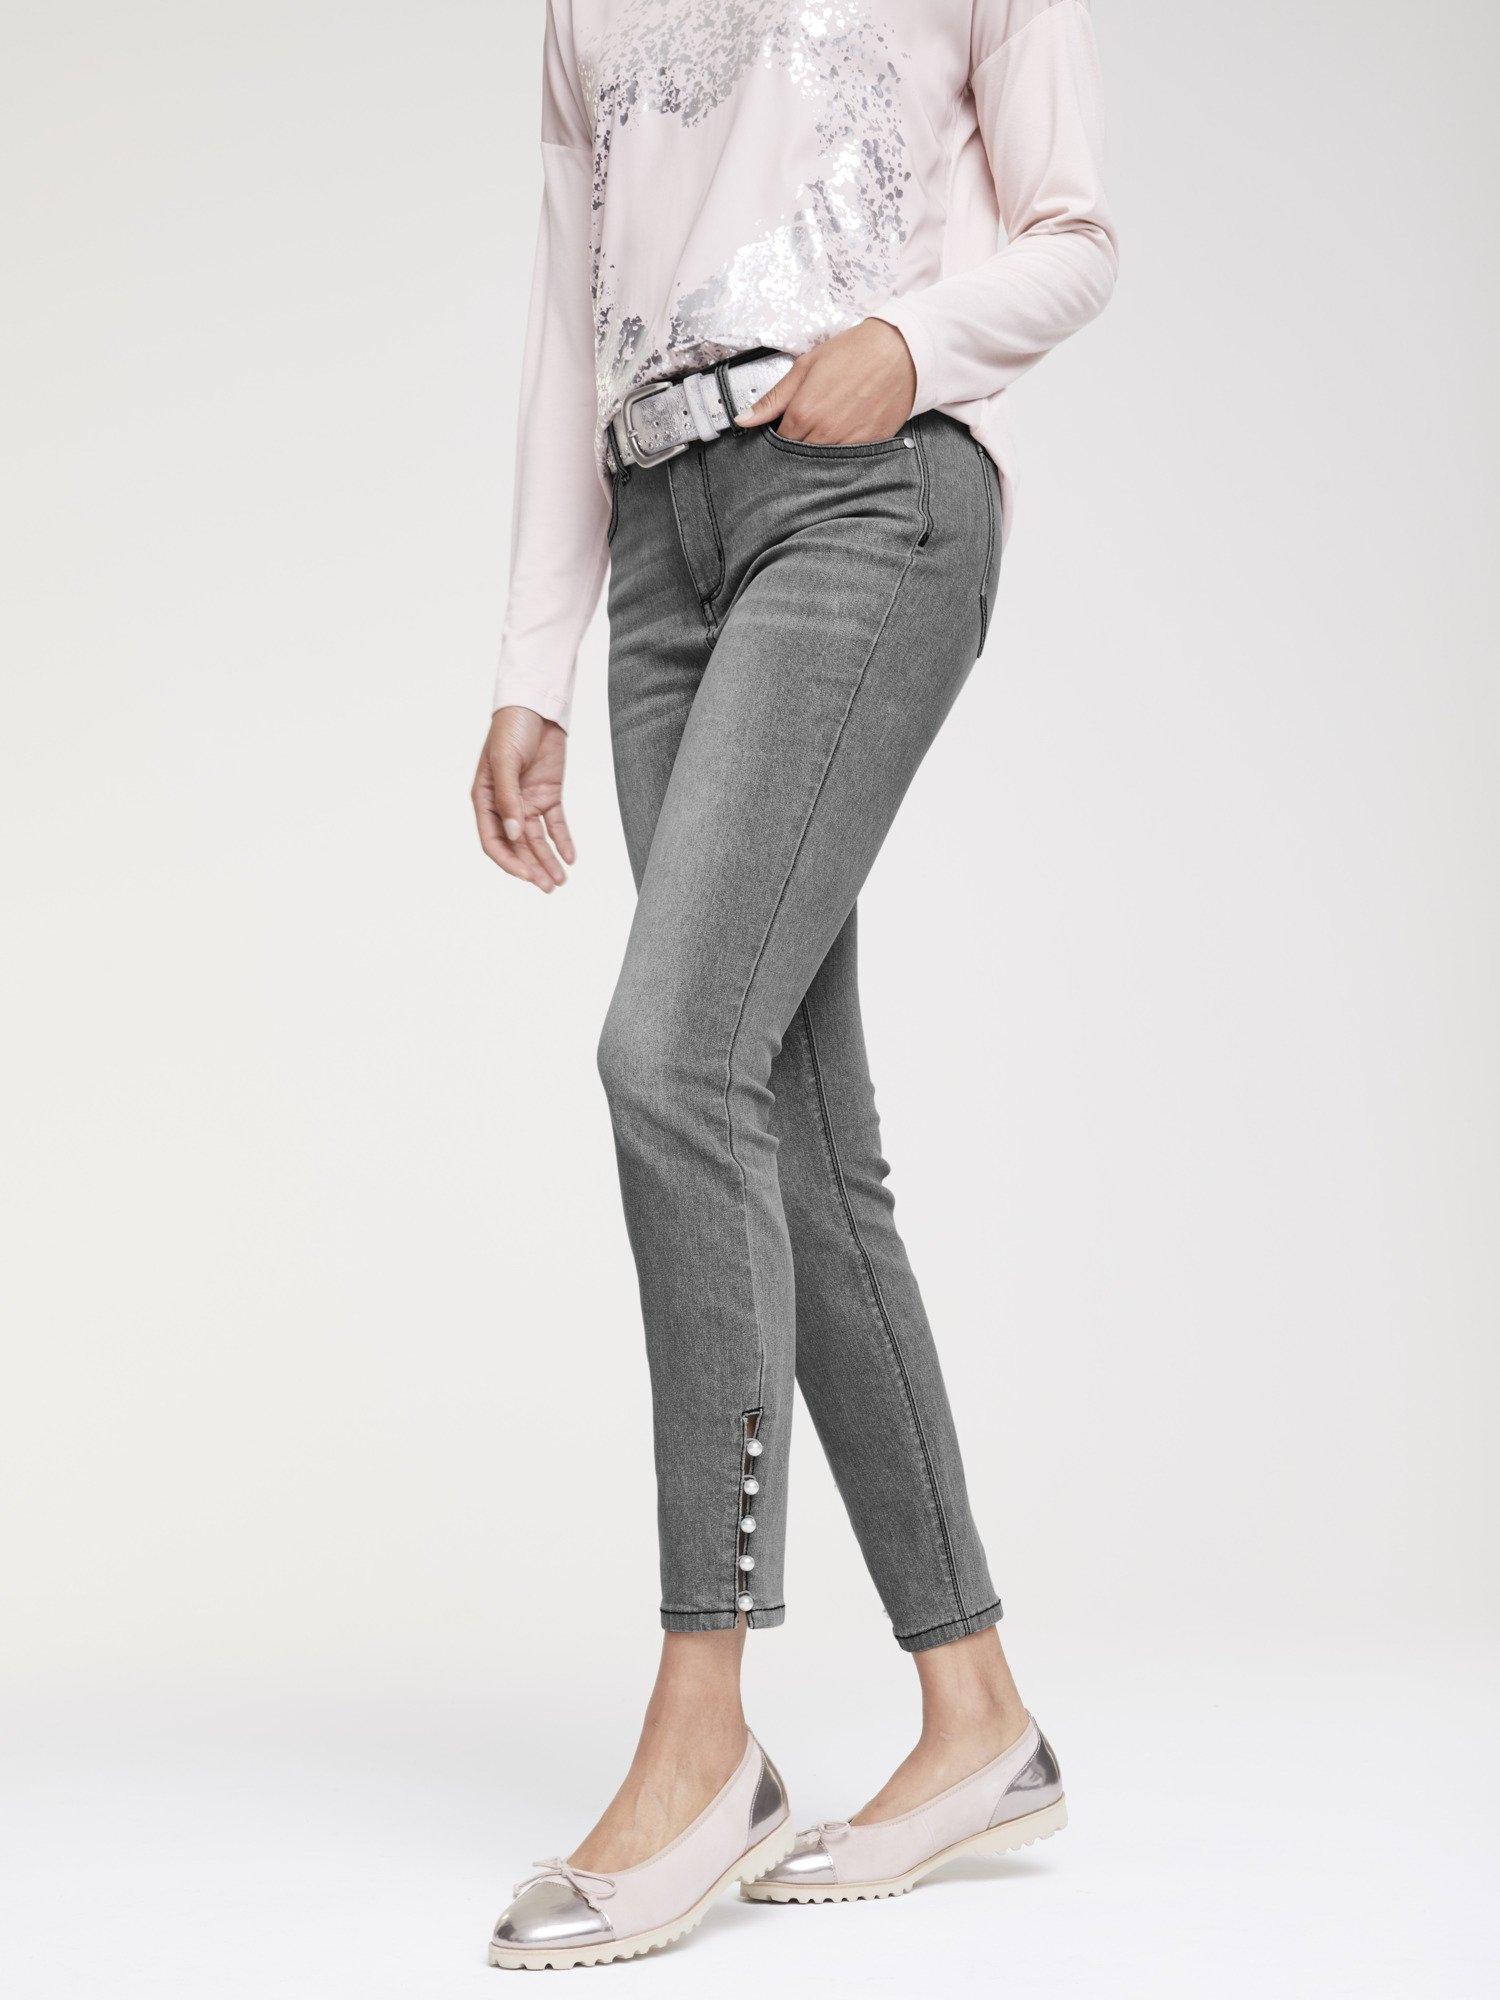 LINEA TESINI by Heine Corrigerende jeans voordelig en veilig online kopen